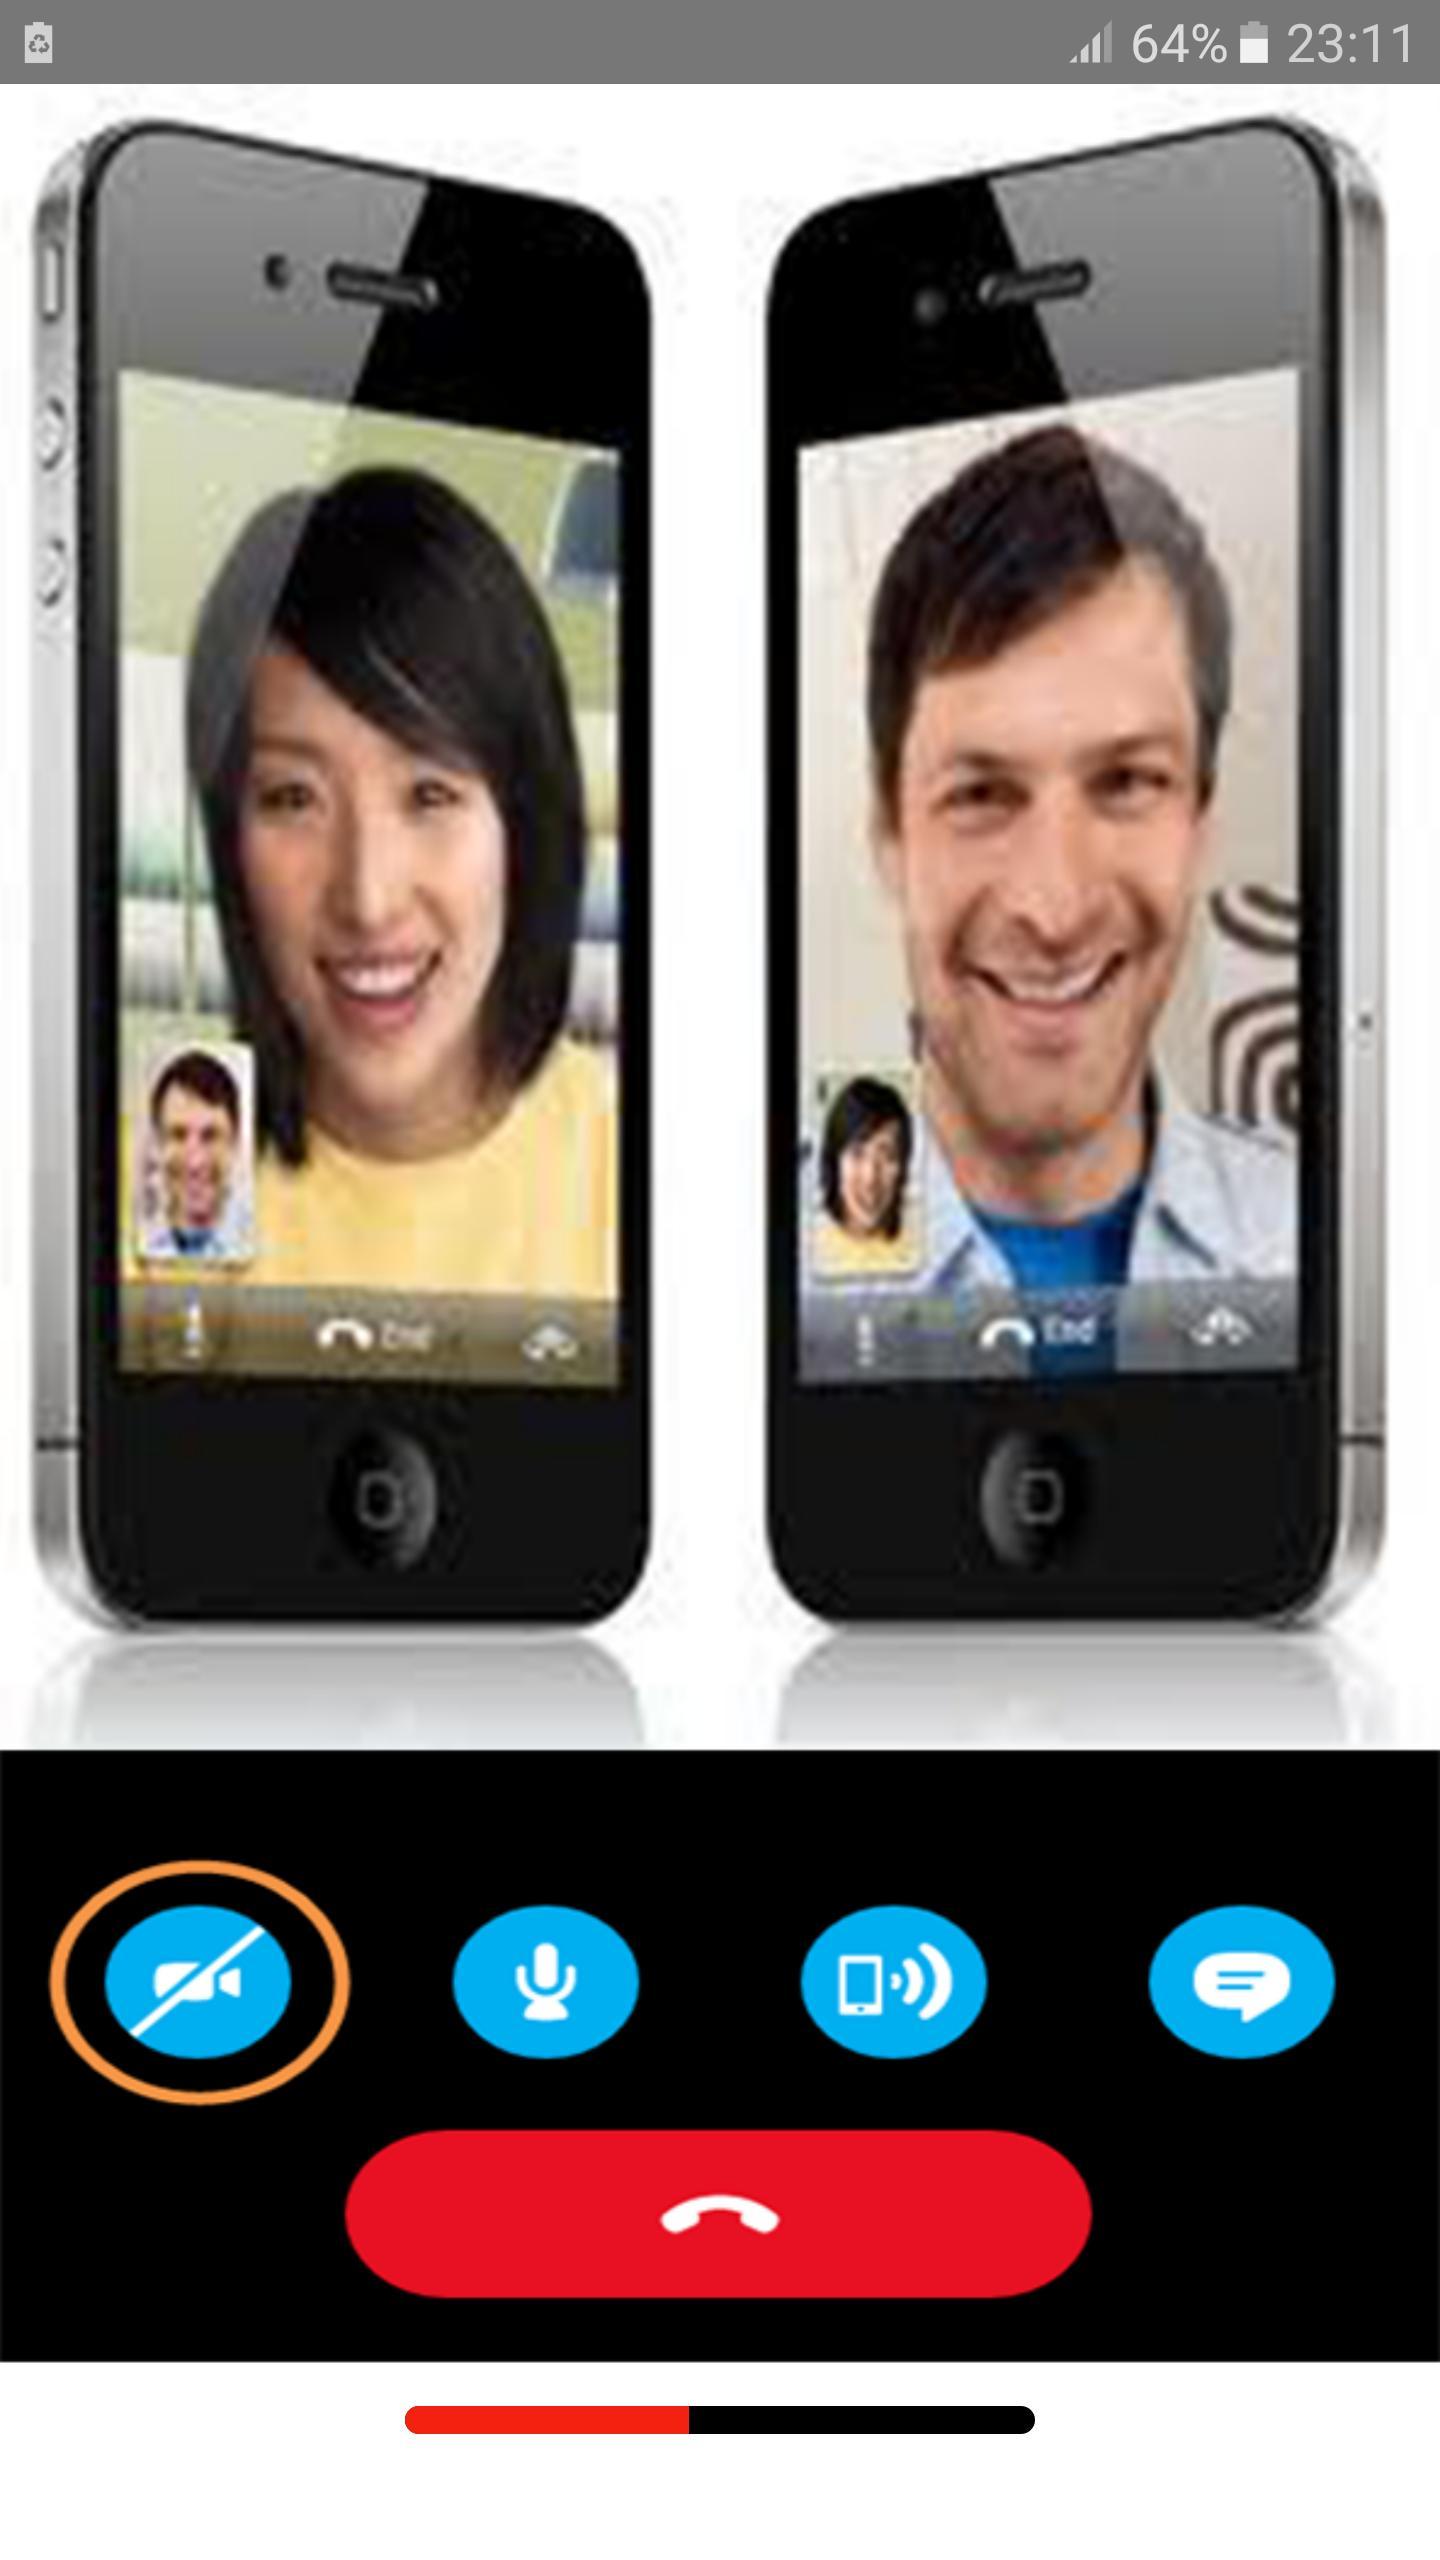 دردشة فيديو مباشرة حول العالم for Android - APK Download